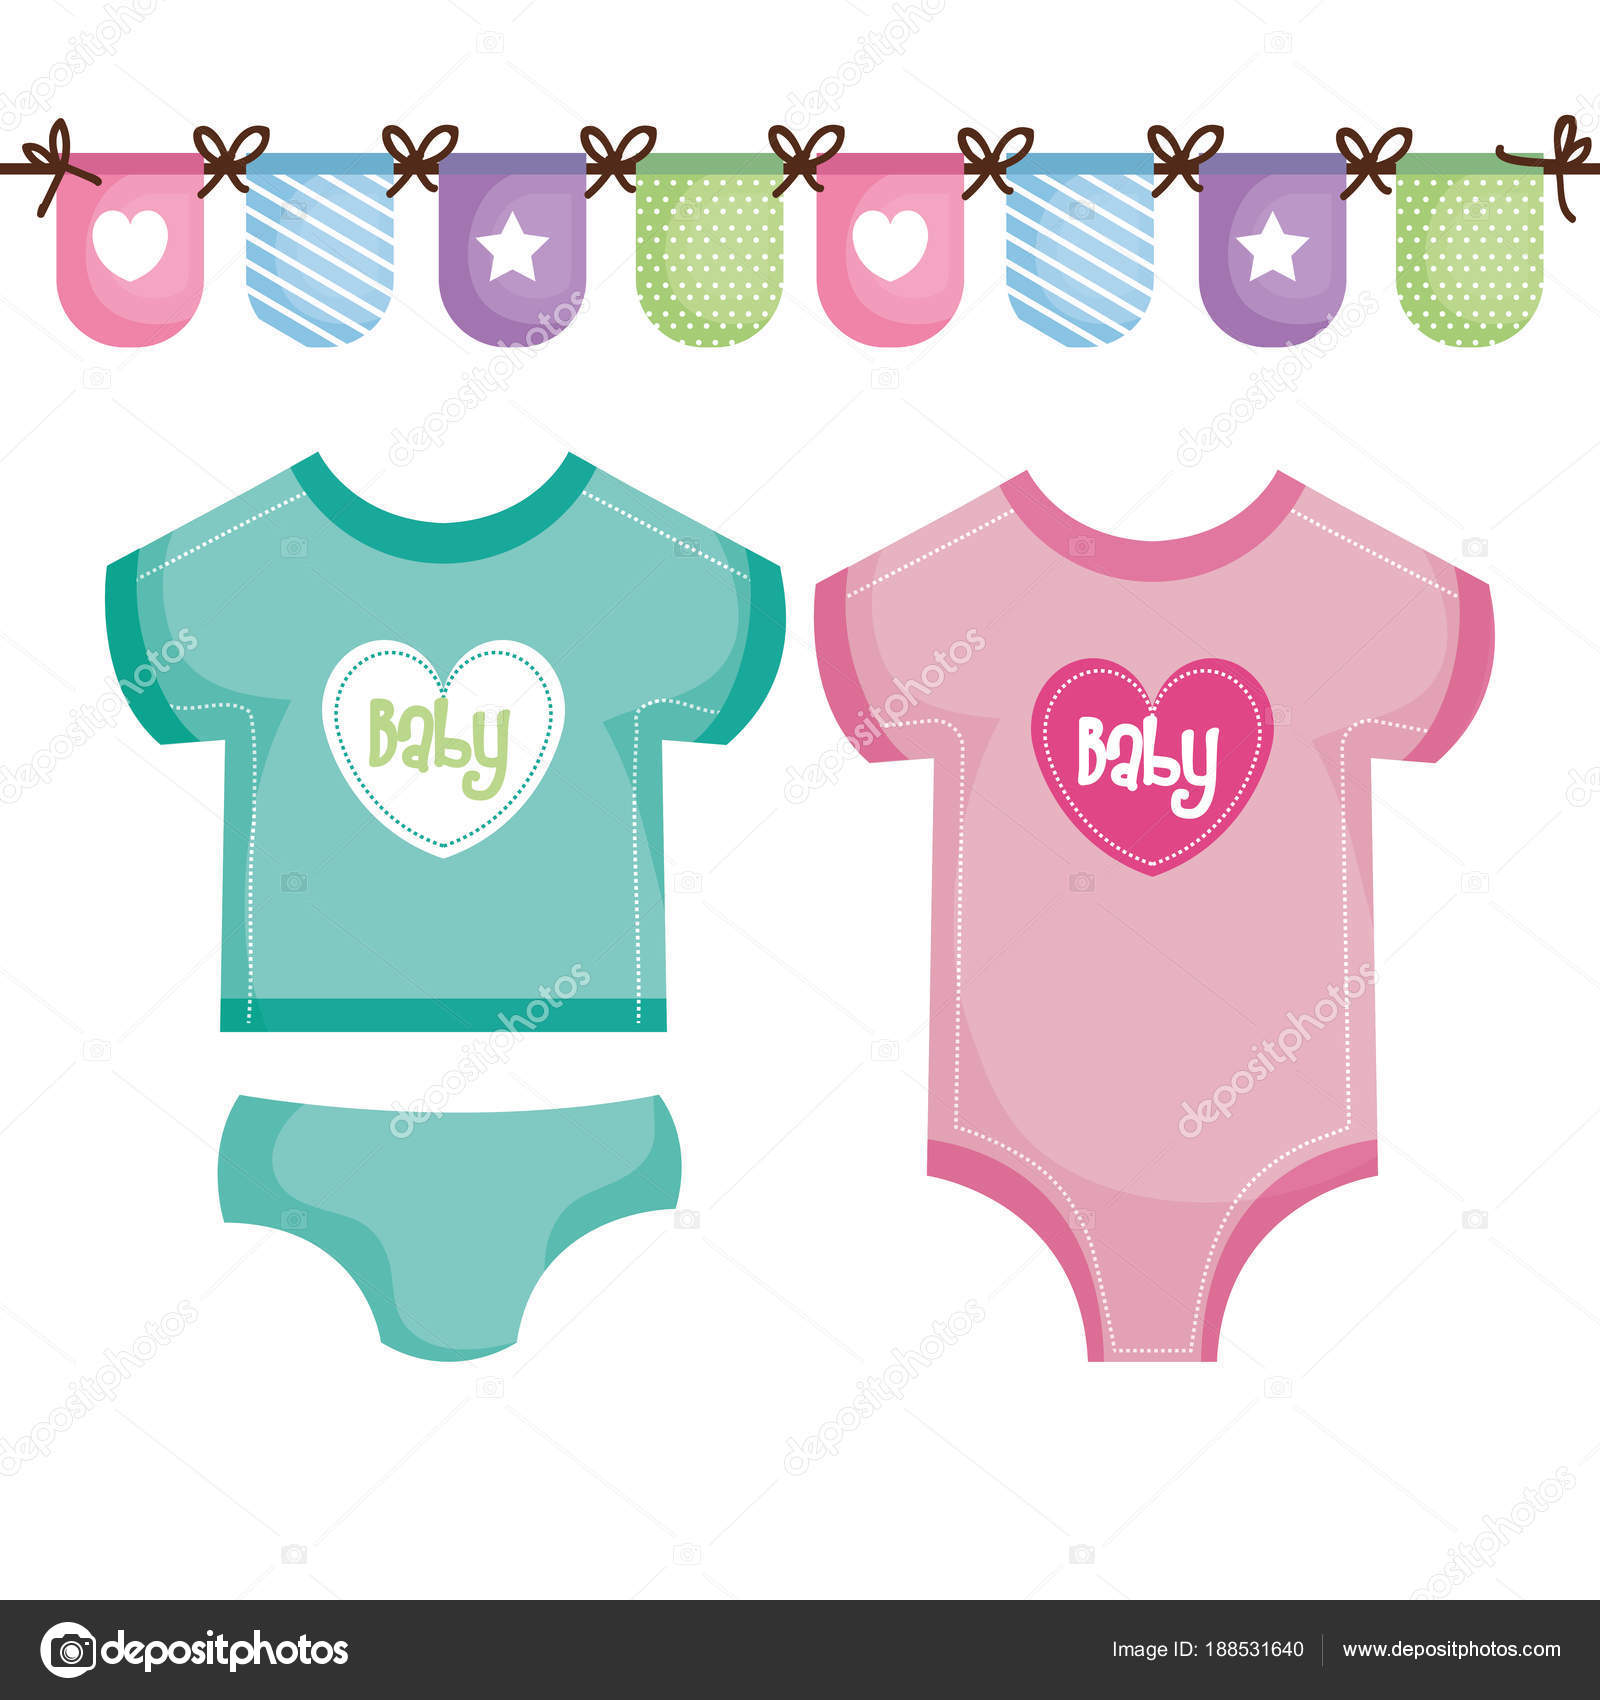 new style 2fe97 35b0a Baby-Kleidung-design — Stockvektor © yupiramos #188531640